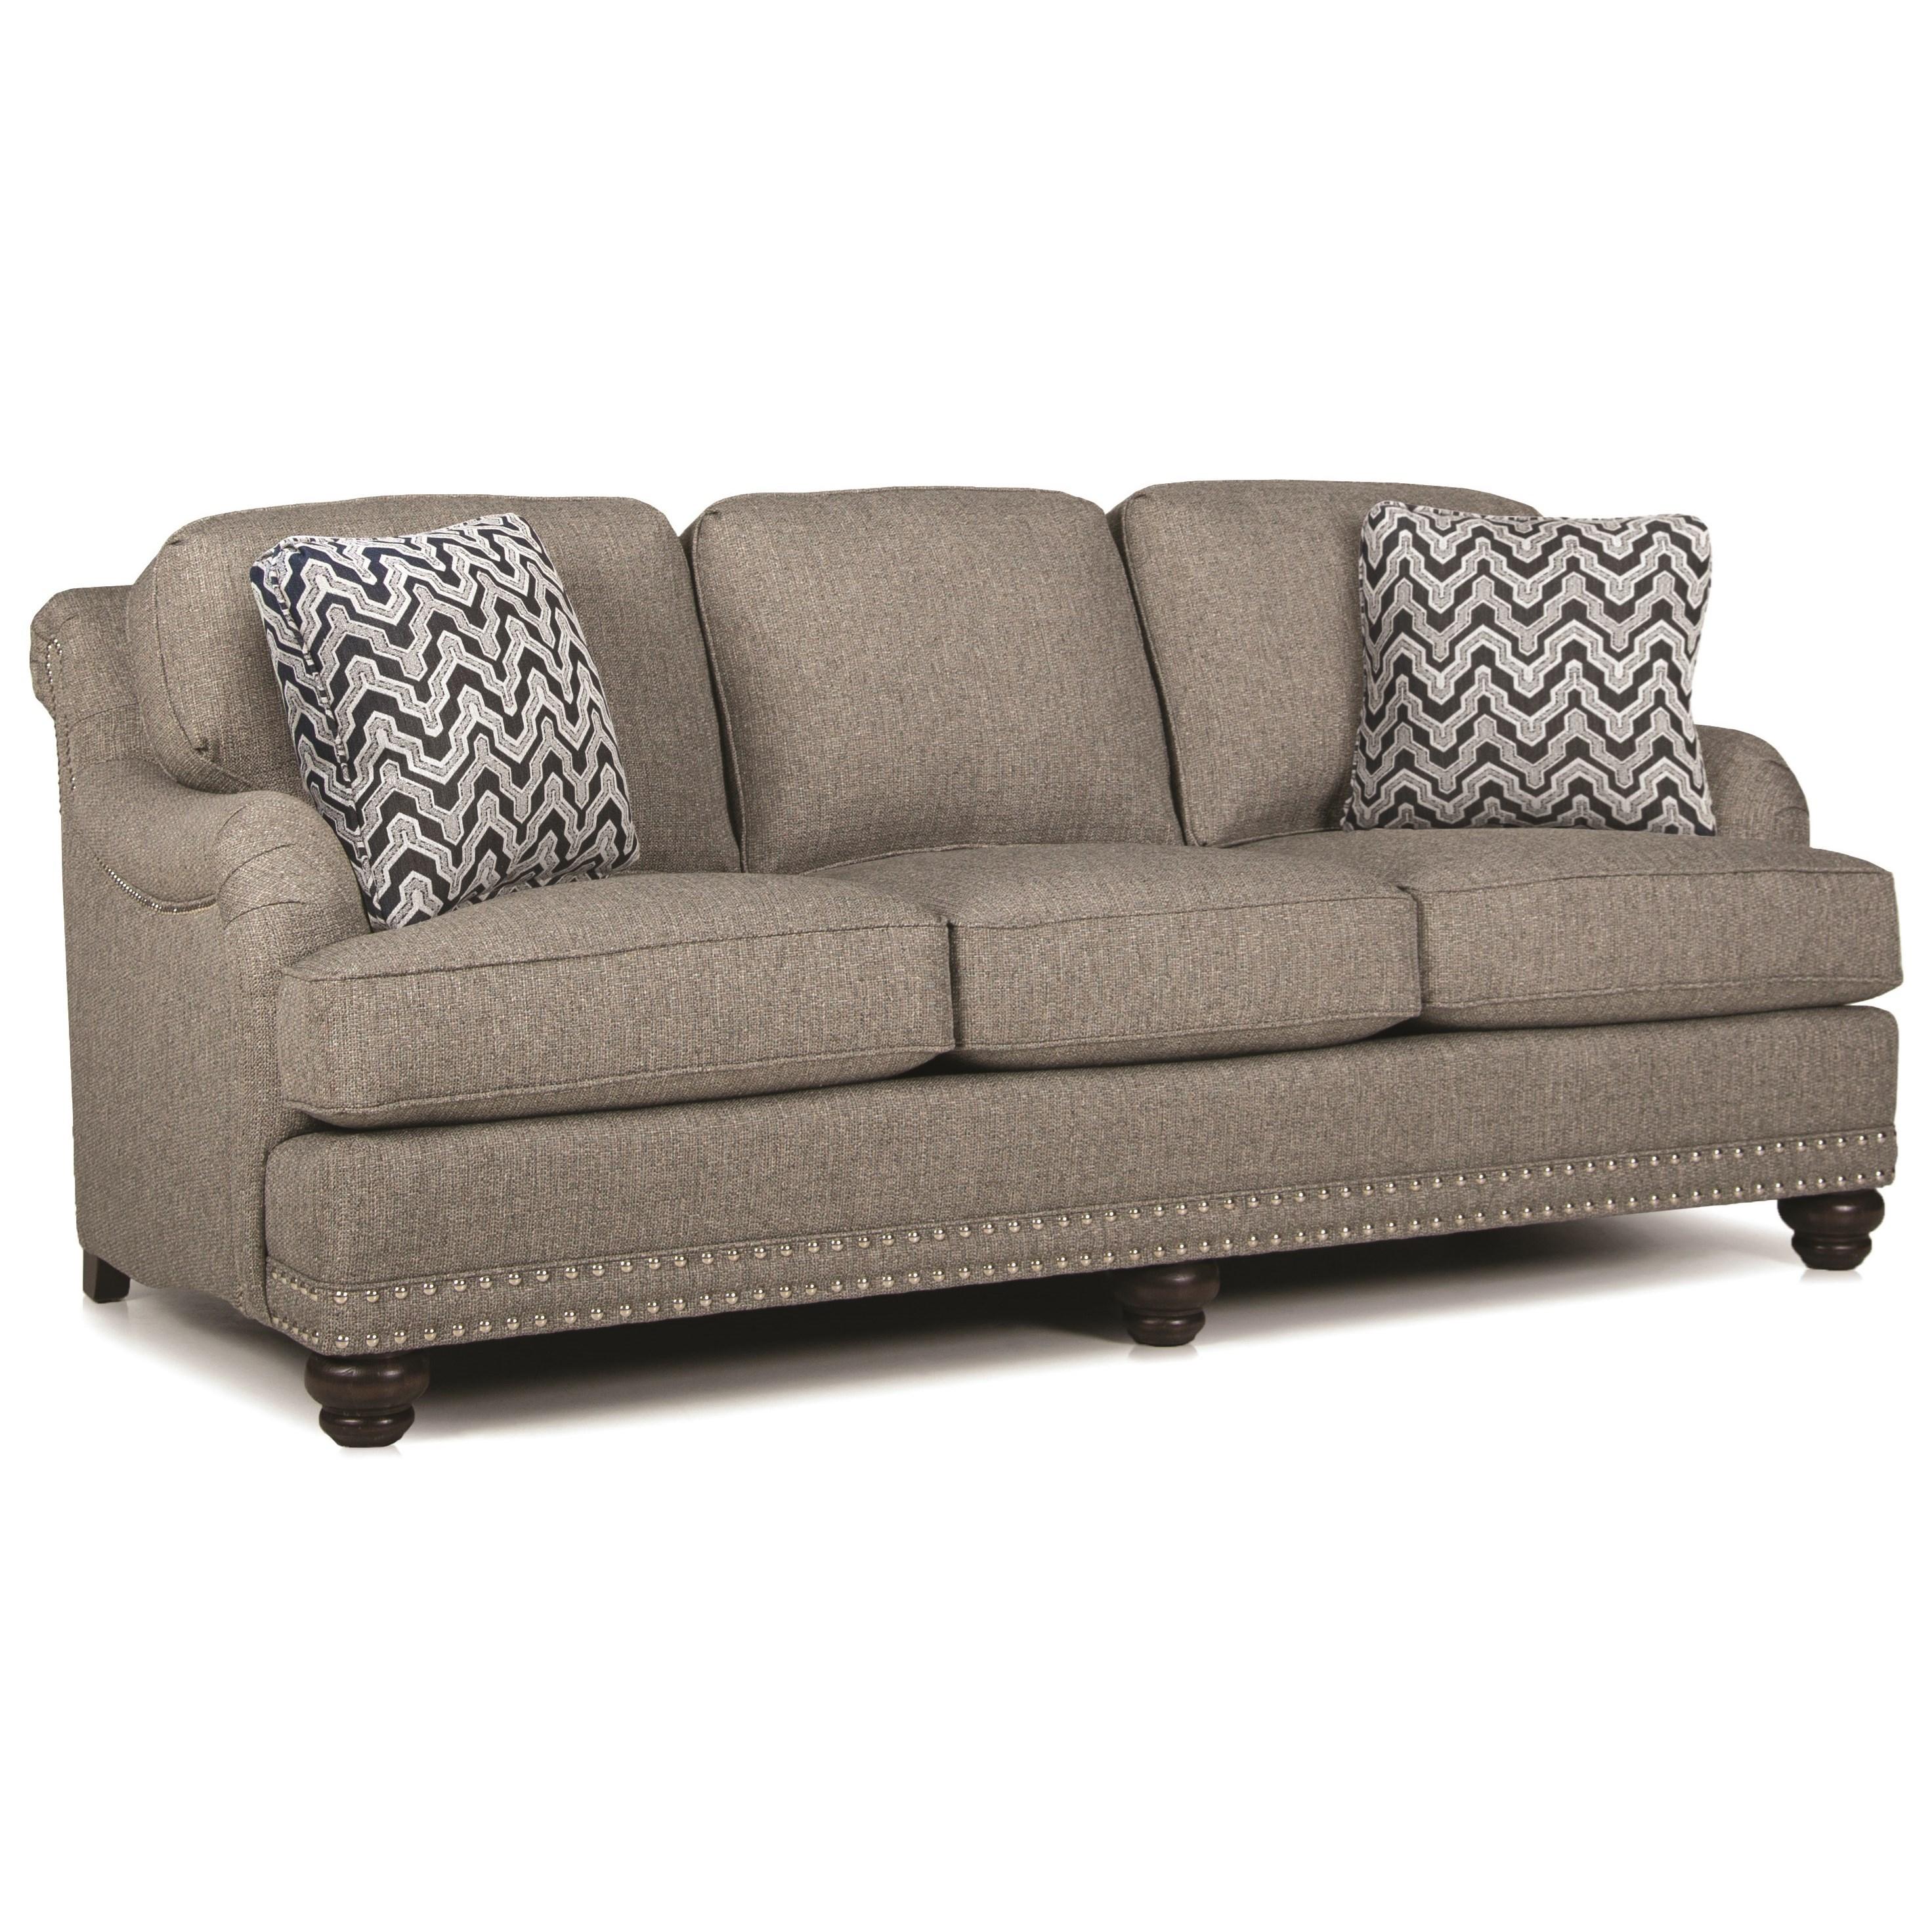 english sofas half moon rattan corner sofa set fine furniture design thesofa